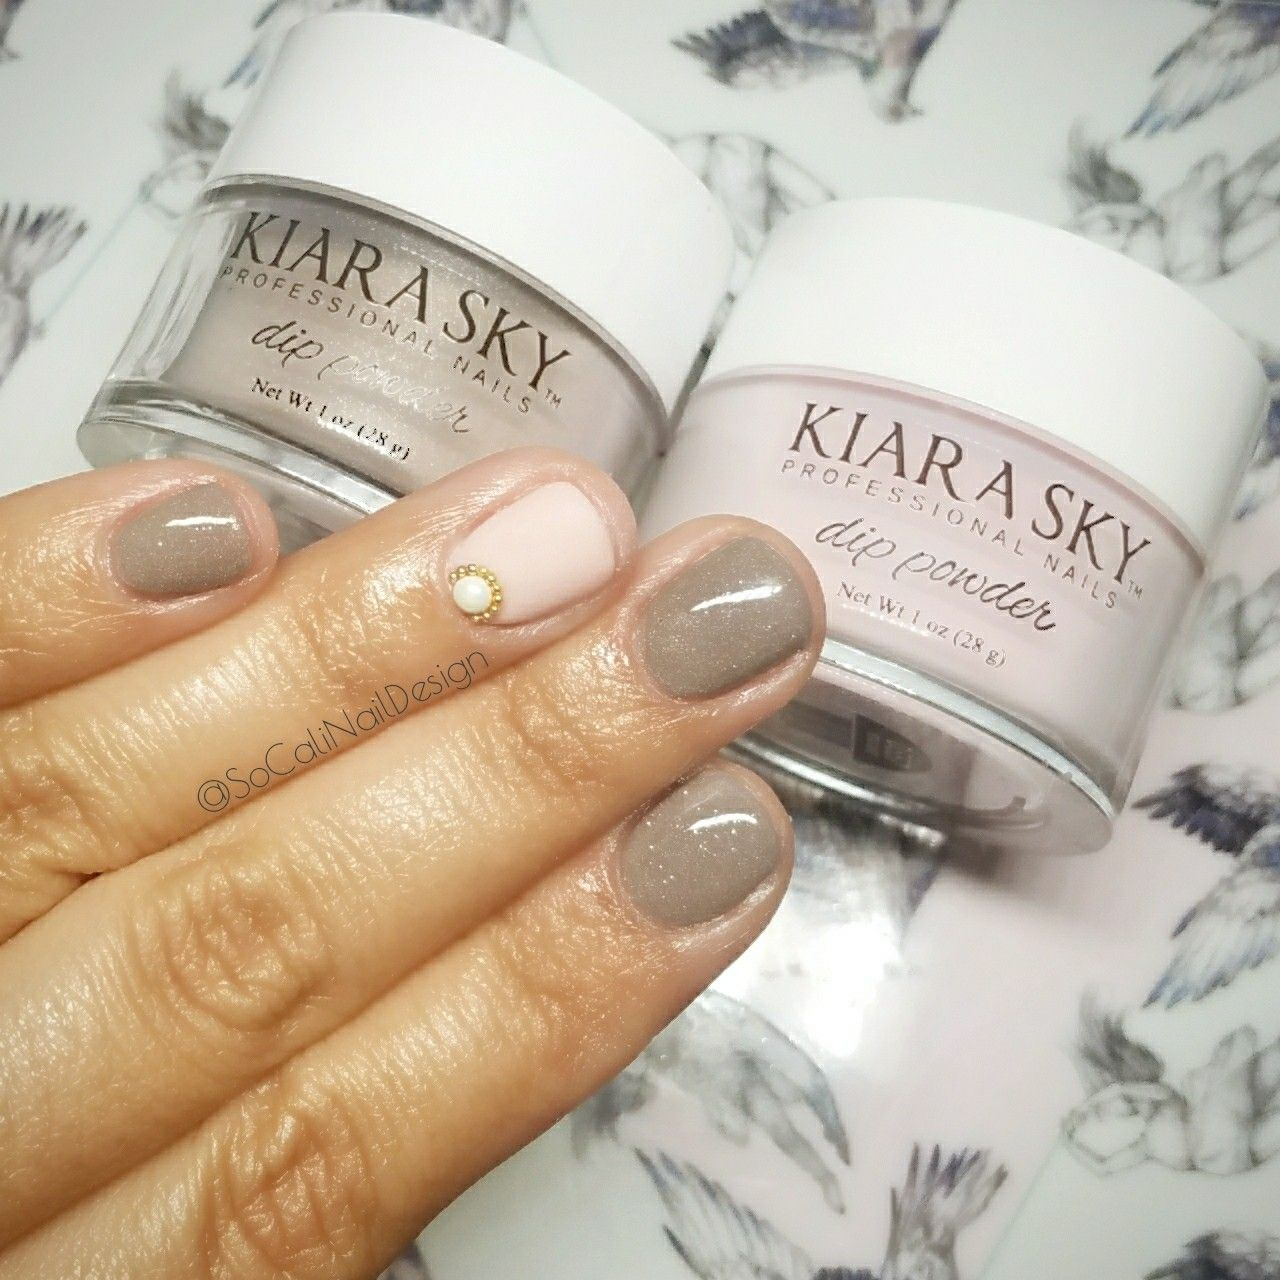 Kiara Sky Dip Powder In Colors Country Chic D512 And Petal Dust D557 With Kupa Matte Top Coat It S My Favorite Dip Powder Nails Powder Nails Dip Nail Colors